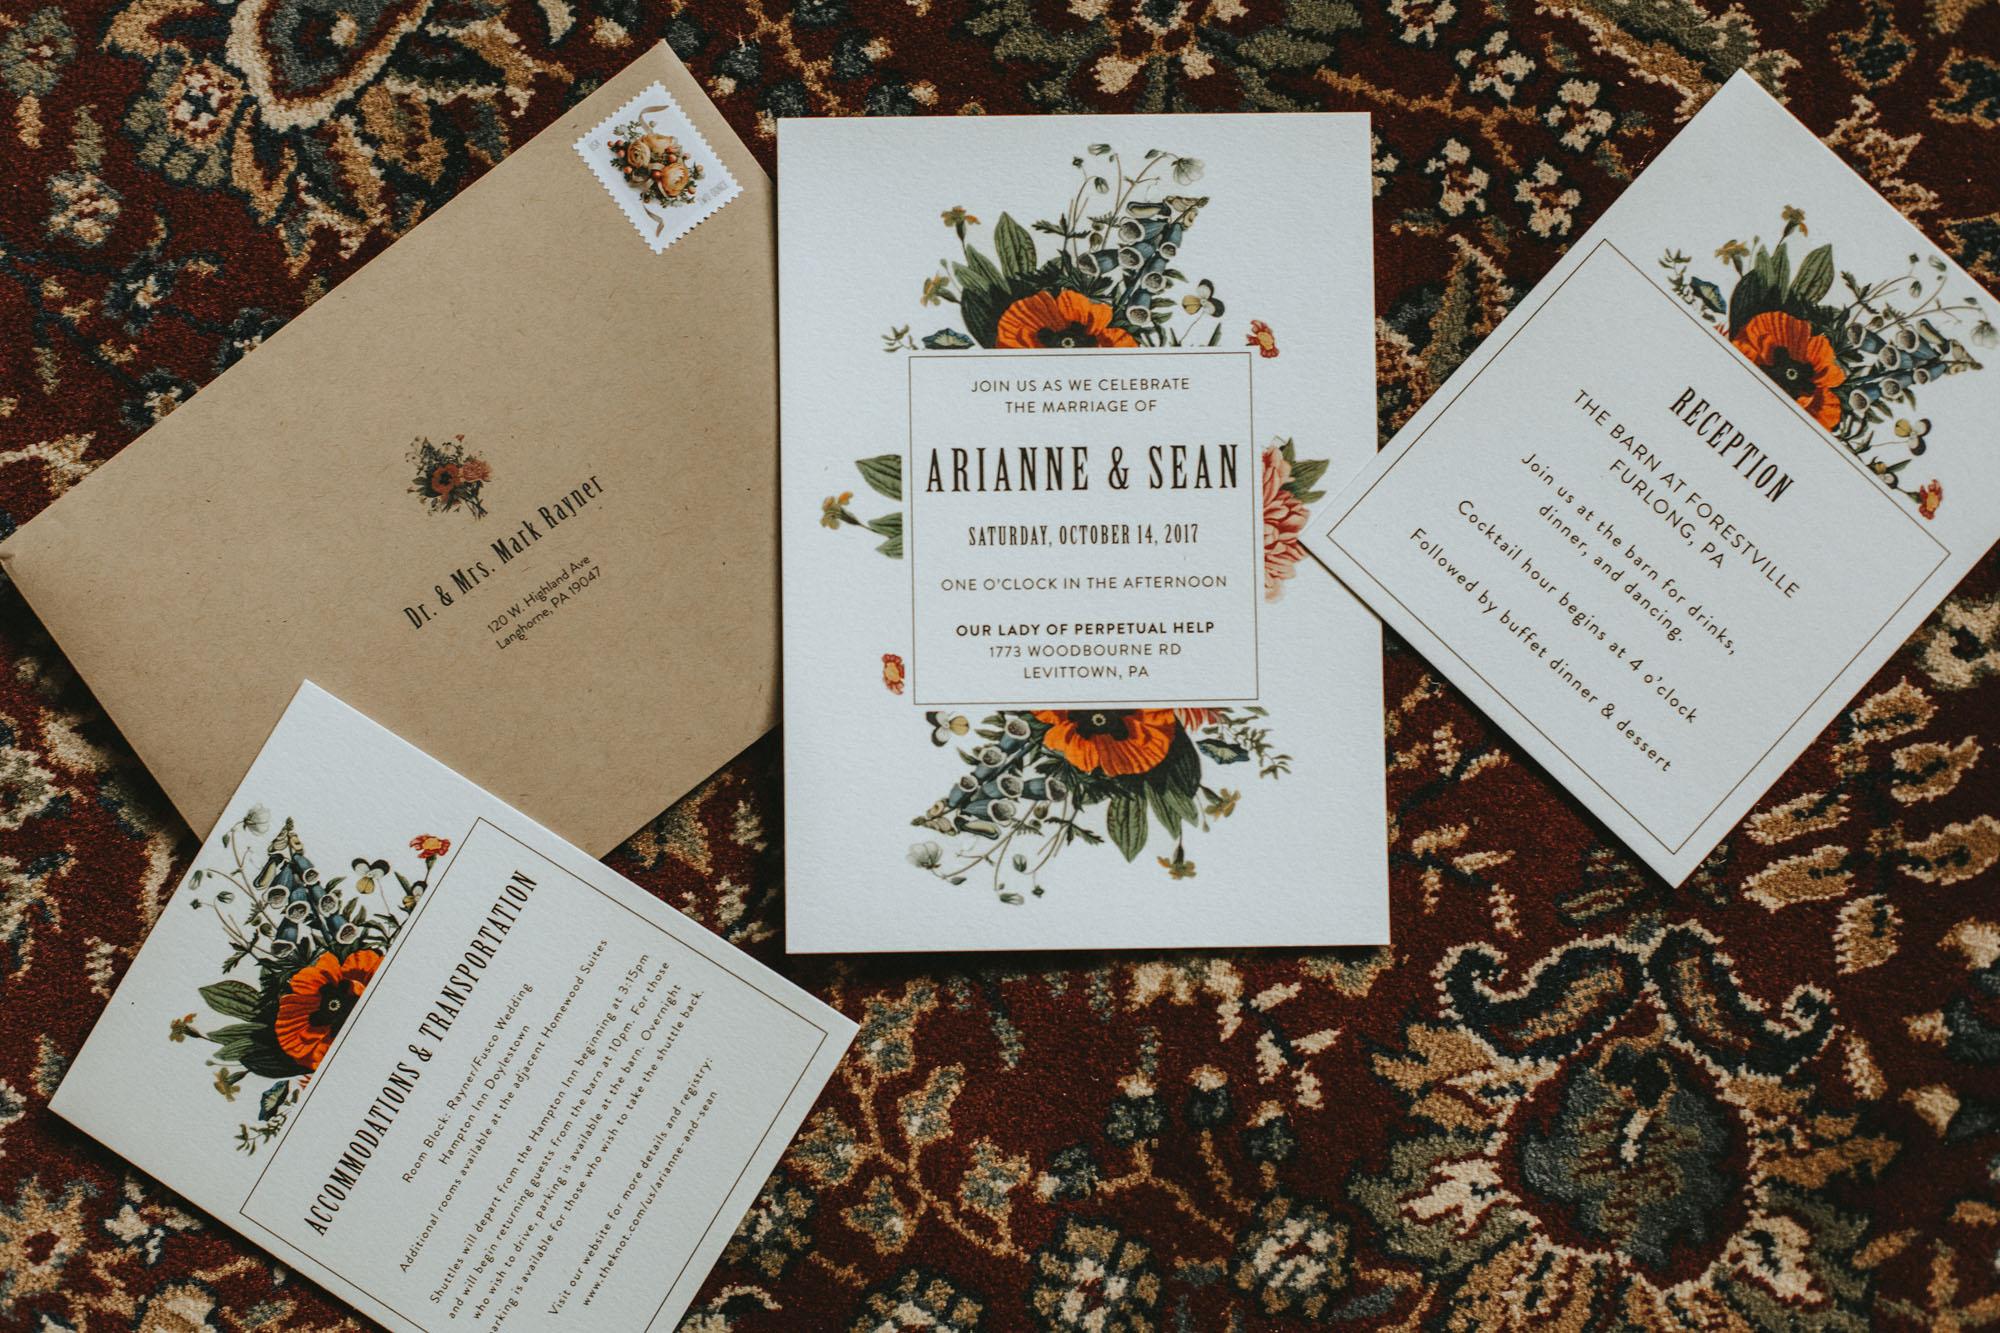 Twisted-Oaks-Studio-Arianne-Sean-Wedding-25.jpg